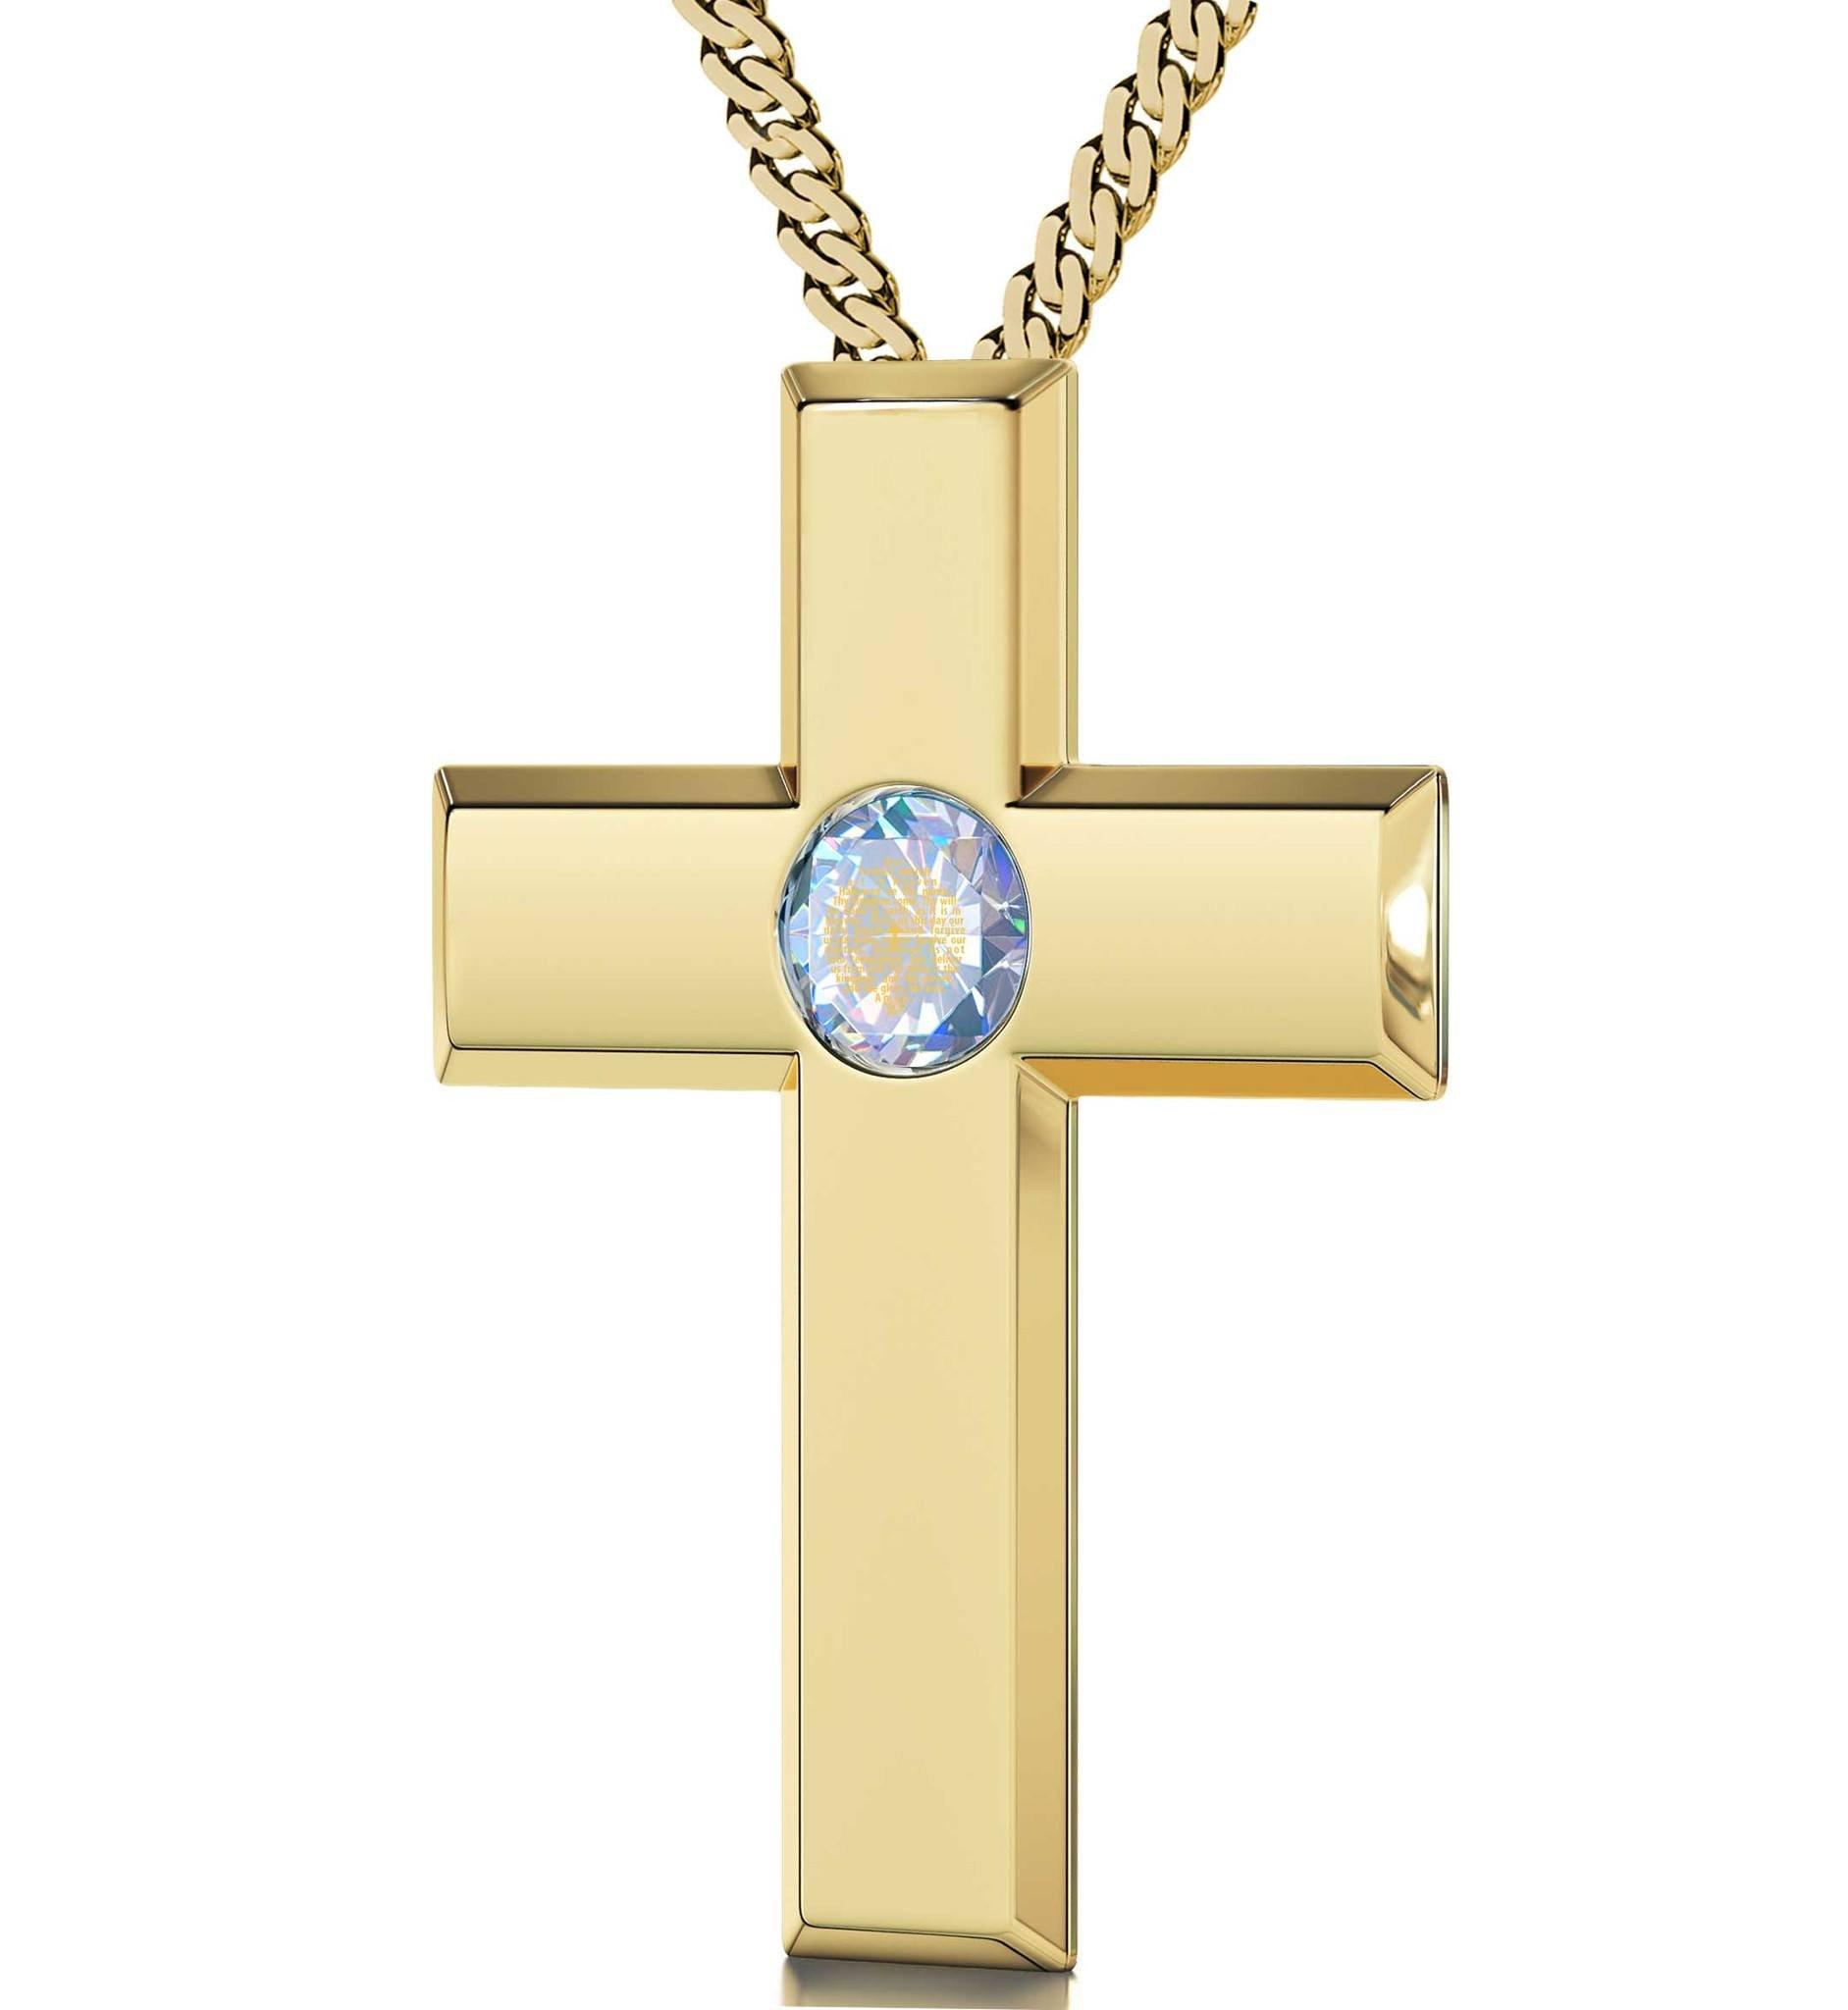 Buy The Lord S Prayer Kj Version Gold Plated Cross